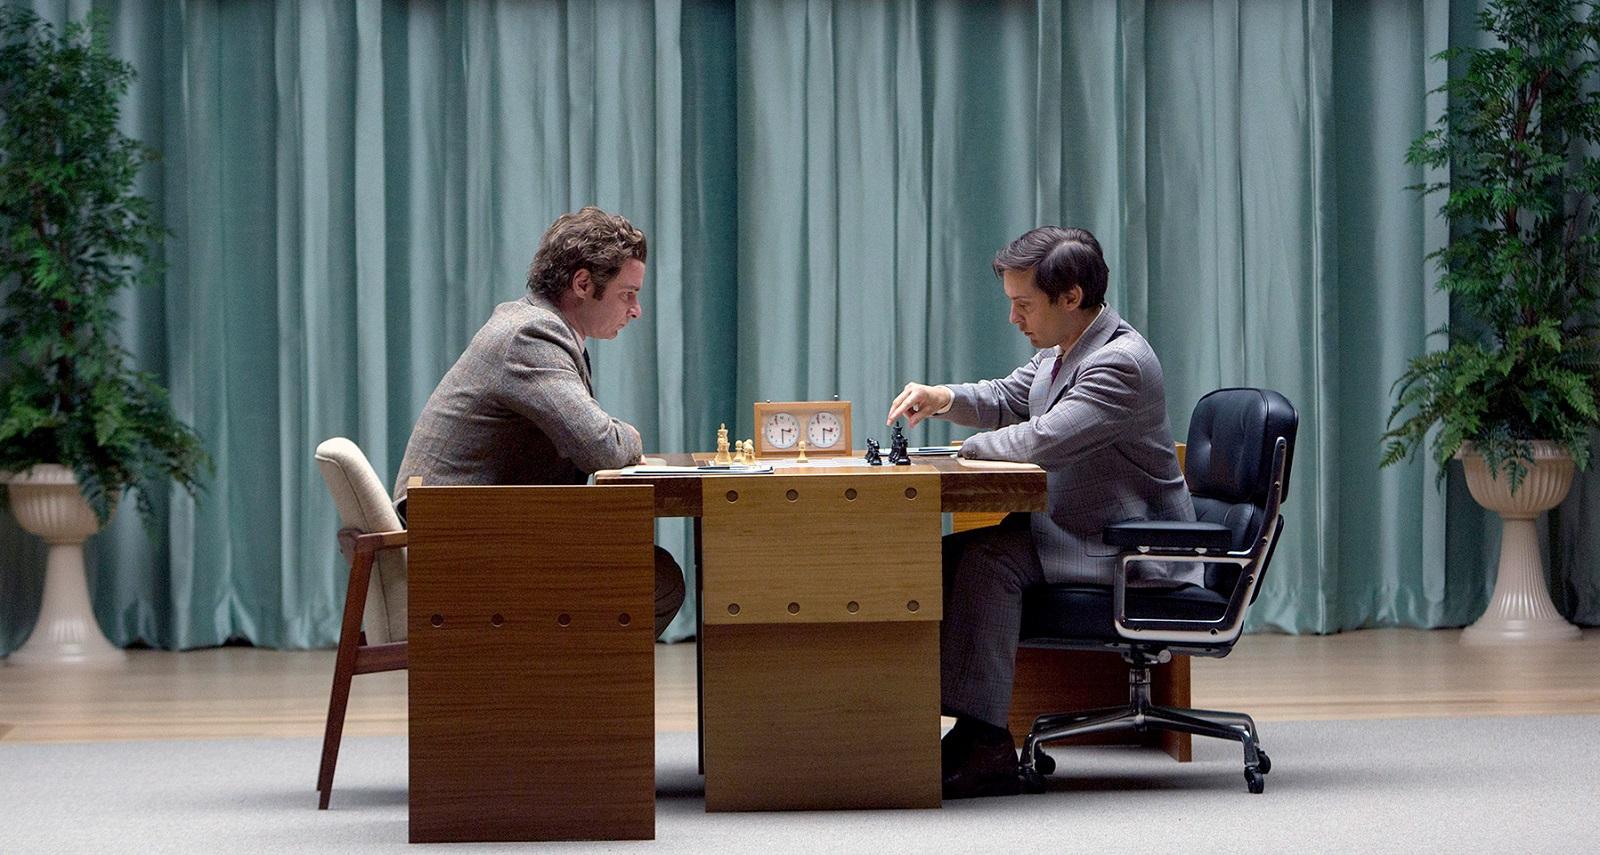 Liev Schreiber (left) is Boris Spassky and Tobey Maguire (right) is Bobby Fischer in 'Pawn Sacrifice.' (Takashi Seida/Bleecker Street Media)